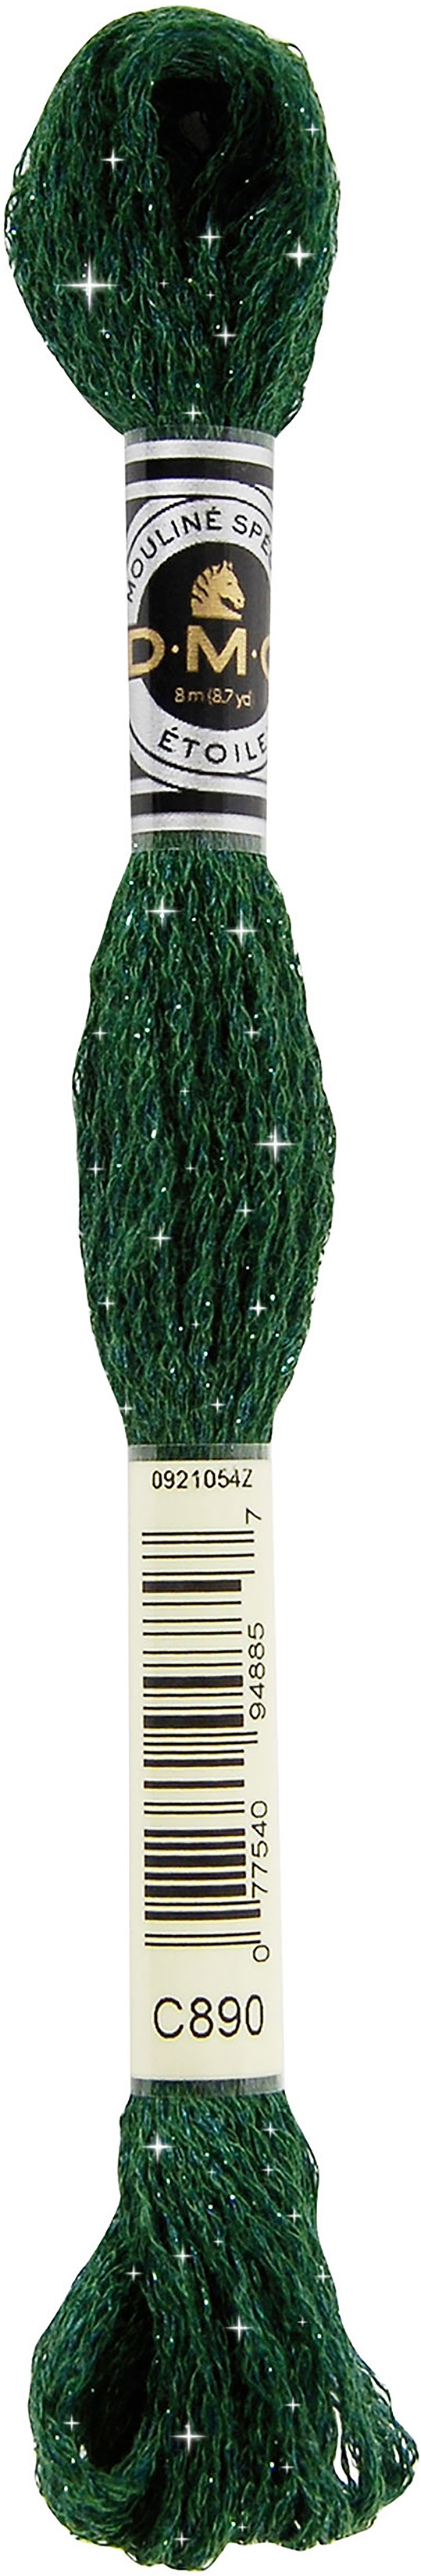 DMC 6-Strand Etoile Embroidery Floss 8.7yd-Ultra Dark Pistachio Green